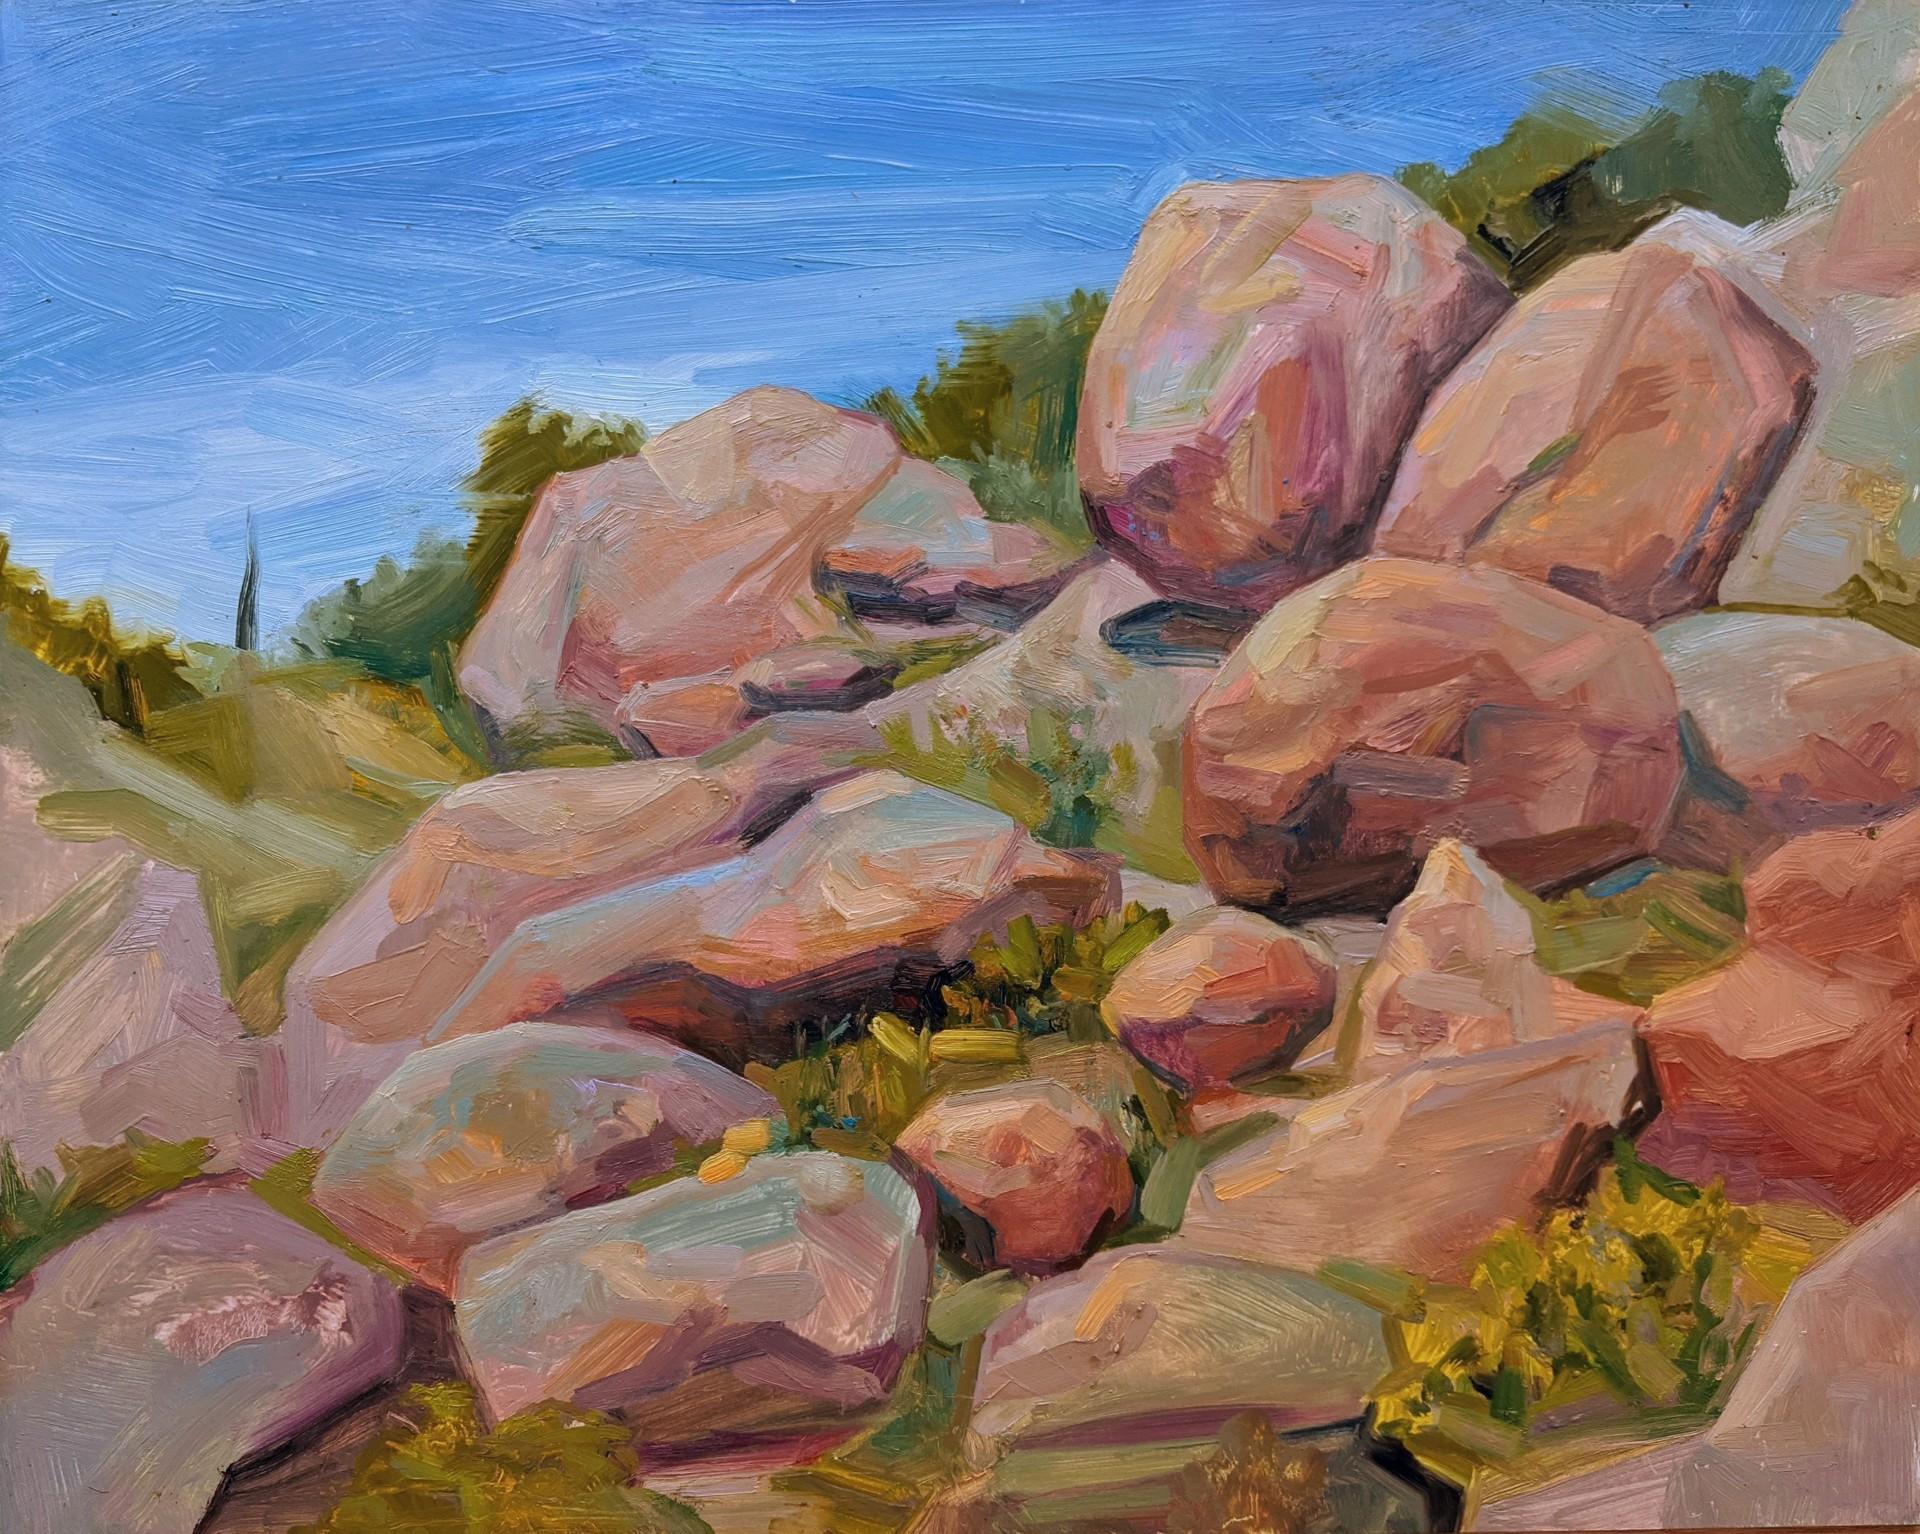 Rocky Forms by Charis Carmichael Braun